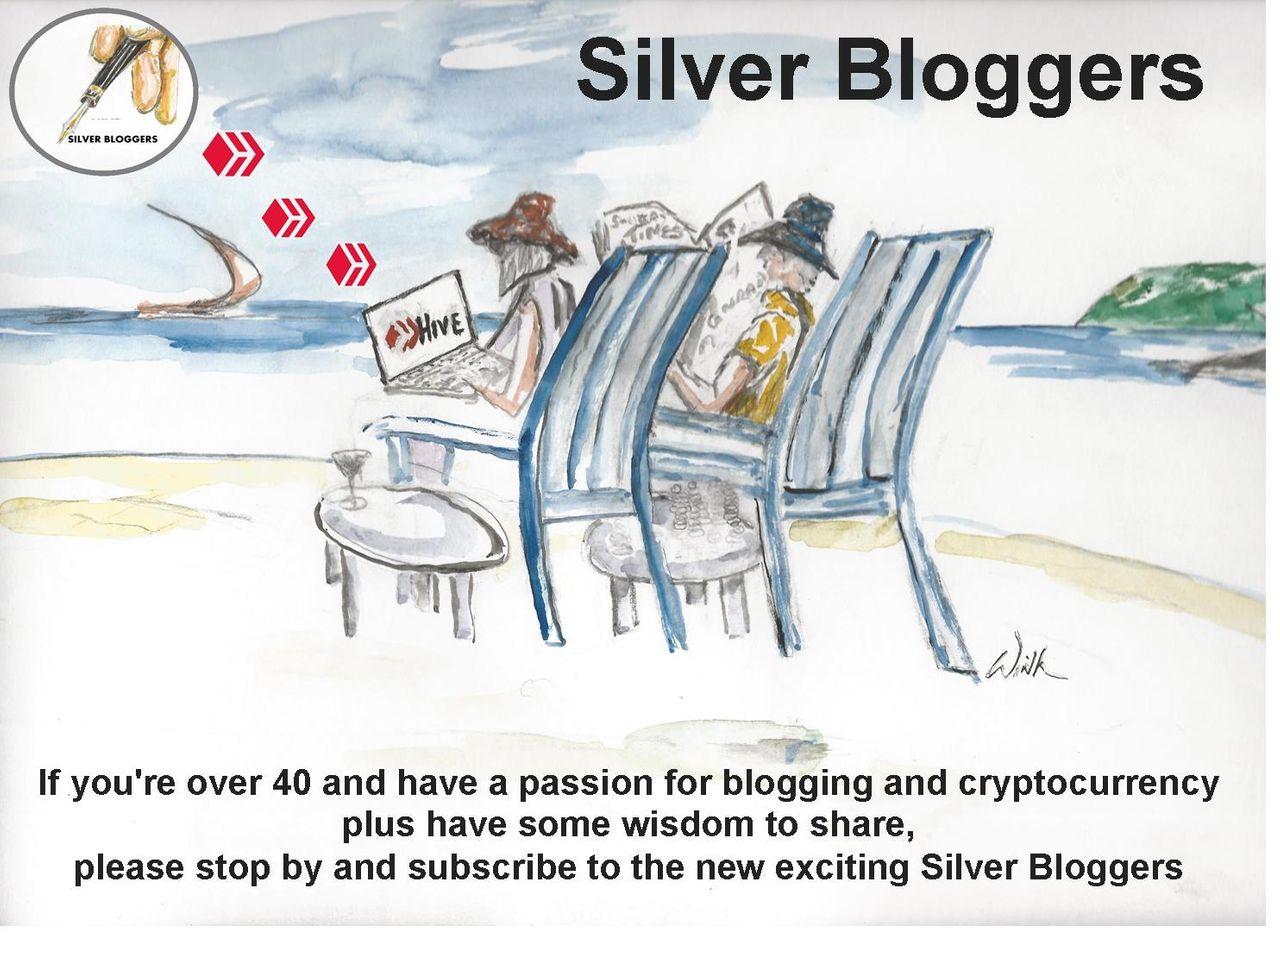 SilverBloggersLogo.jpg